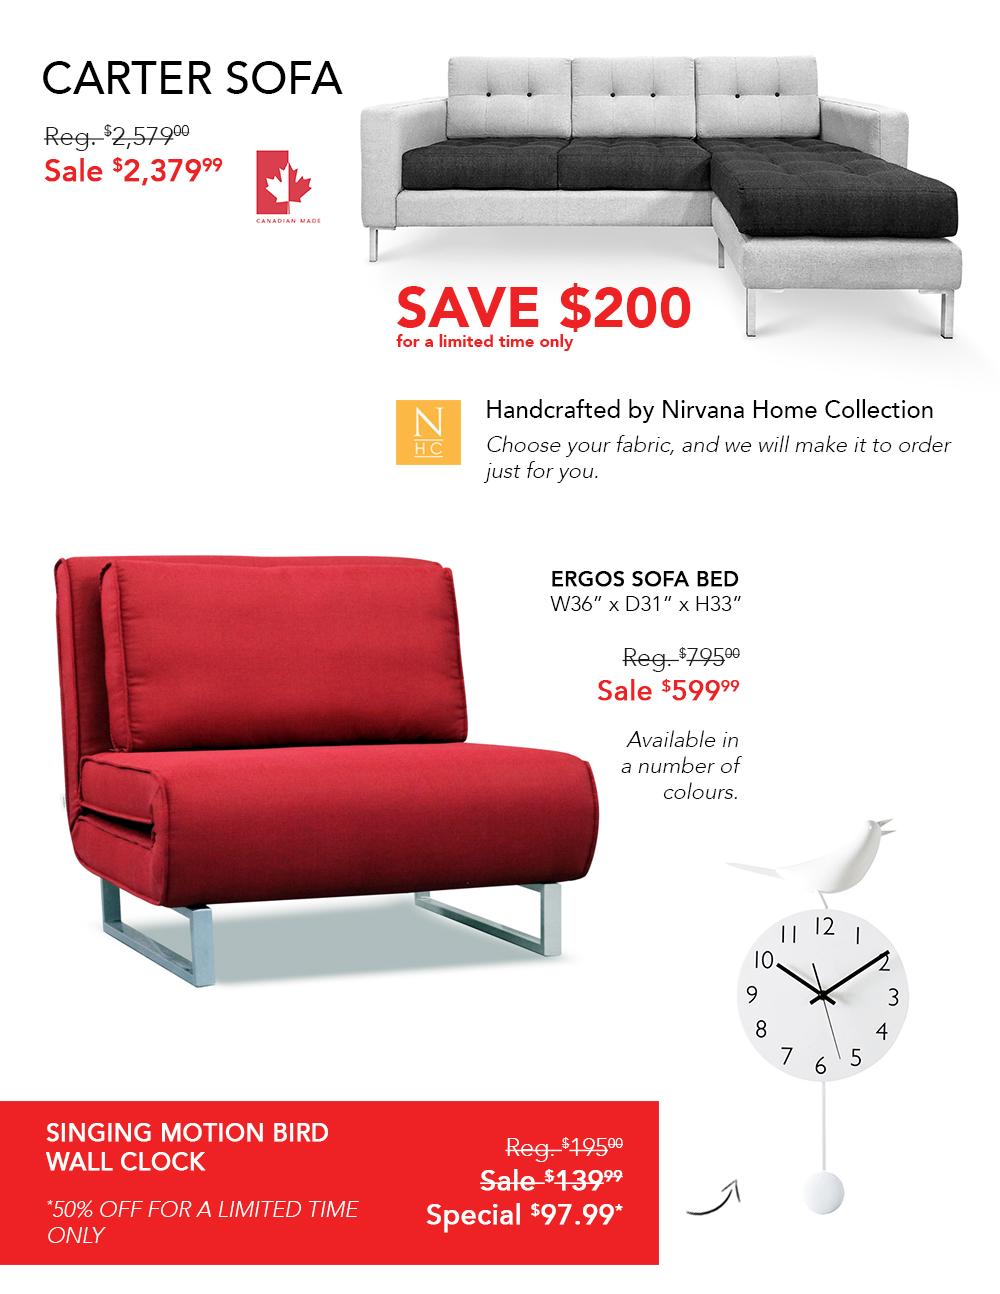 Nirvana Home Collection   Modern Home Furnishings   Furniture   Bedding    Home Decor